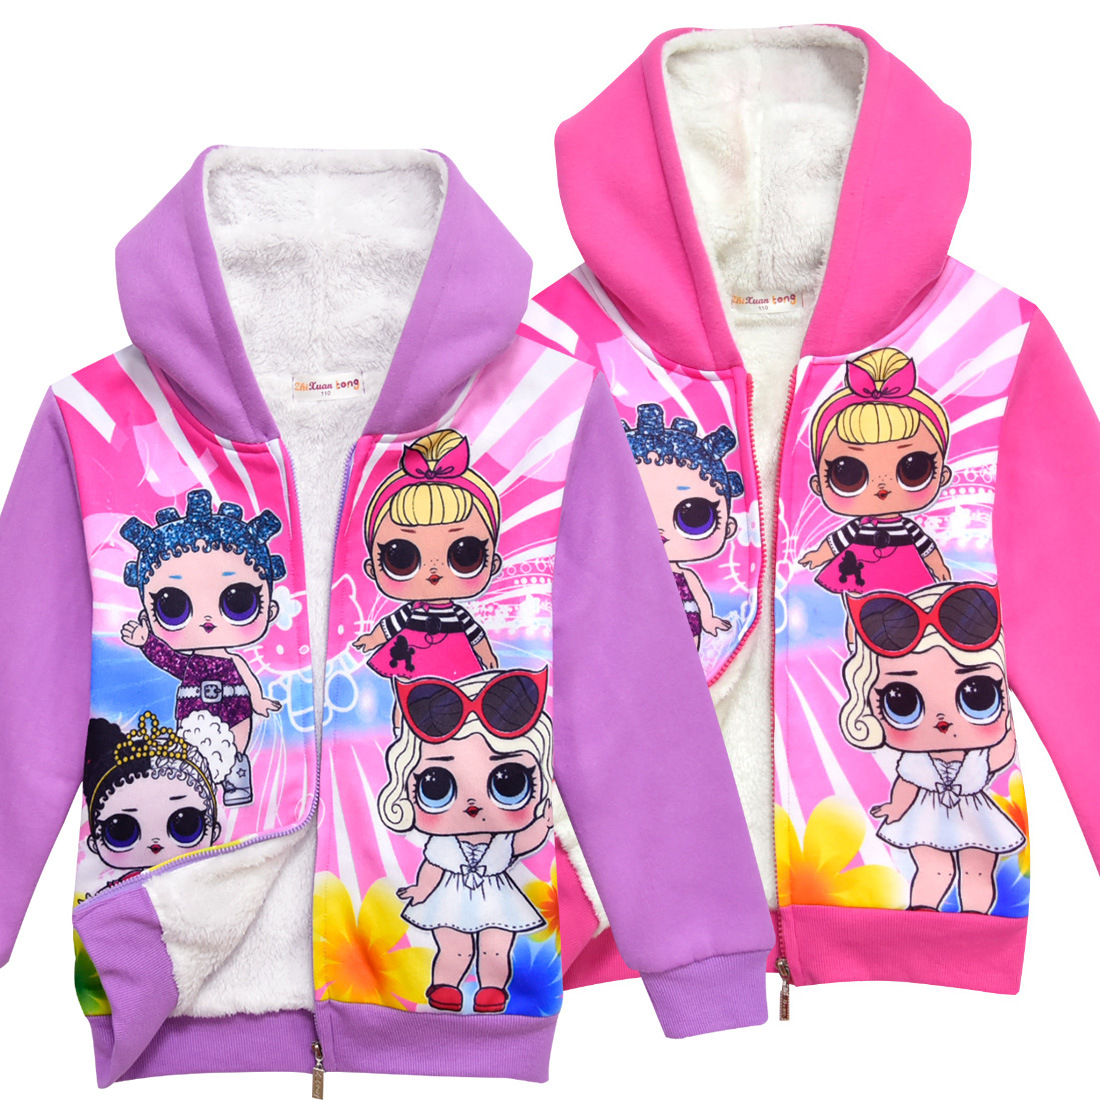 2019 New hot sale girl coat Lol doll shirt girl long sleeved thick Jackets children T shirt children hoodie sweatshirt blouse